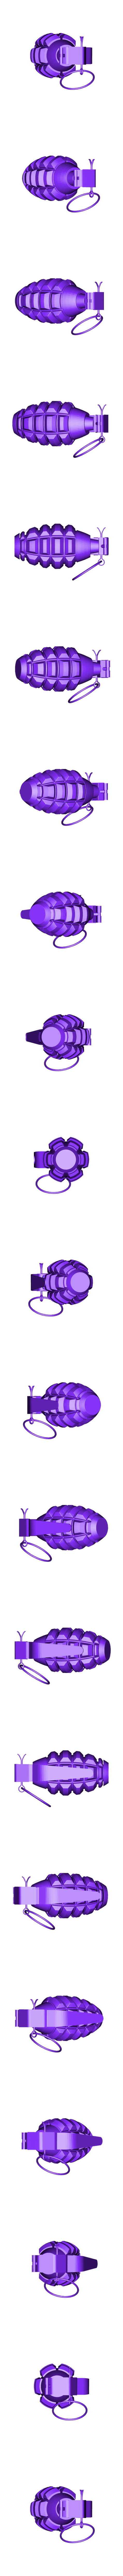 Grenade Farg.STL Download free STL file GRENADE FRAG • 3D printing model, 3dprintcreation